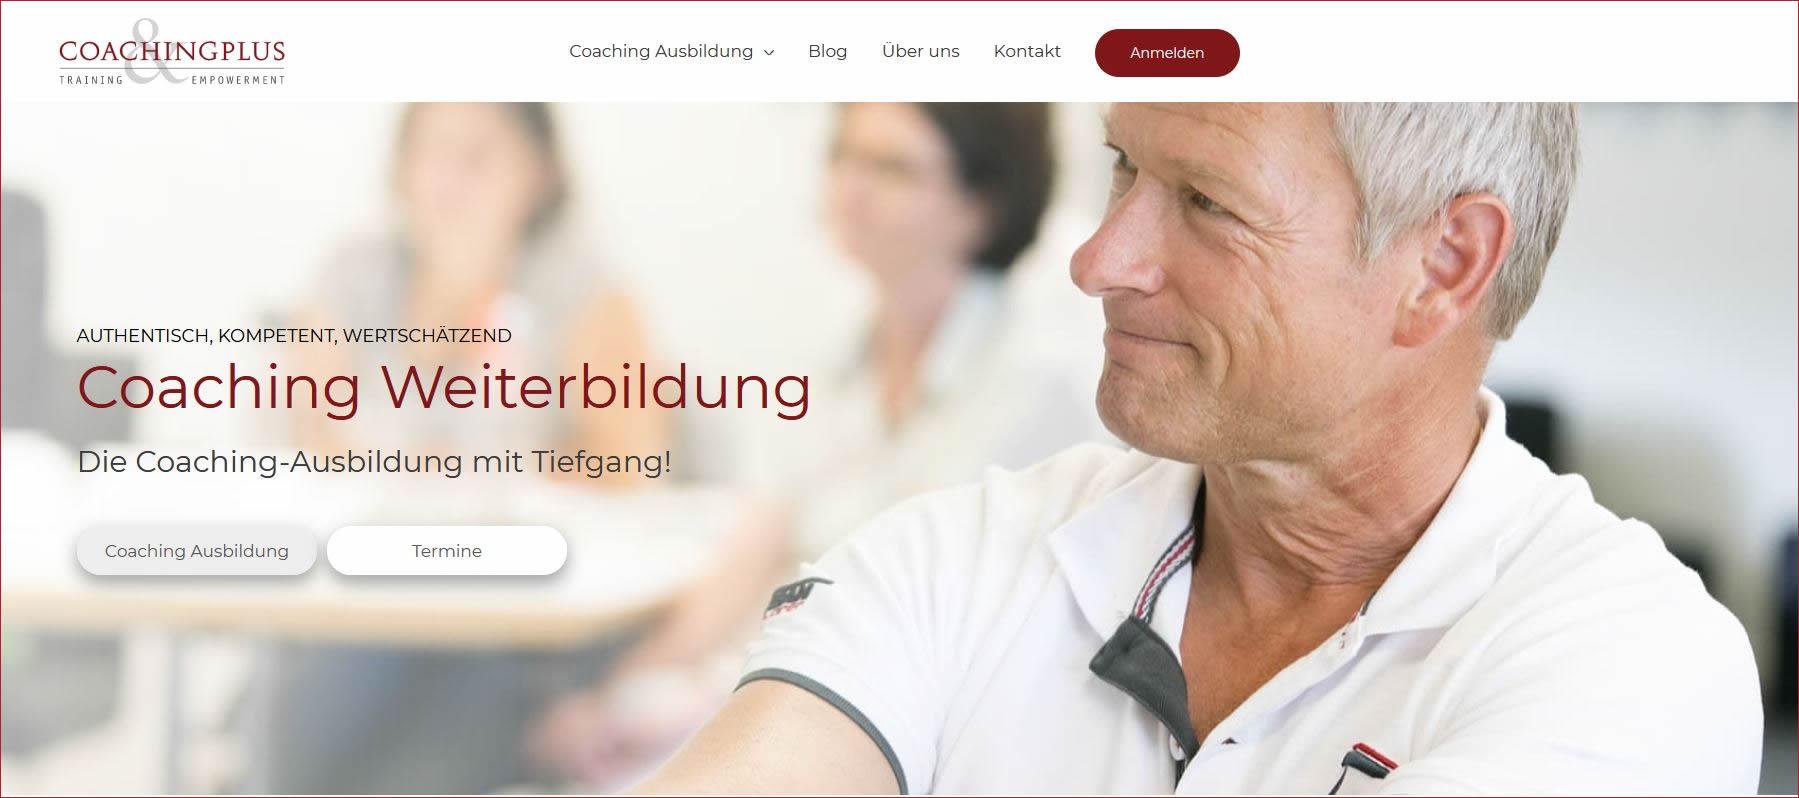 Coachingplus.ch: Studiengang für angewandtes Coaching